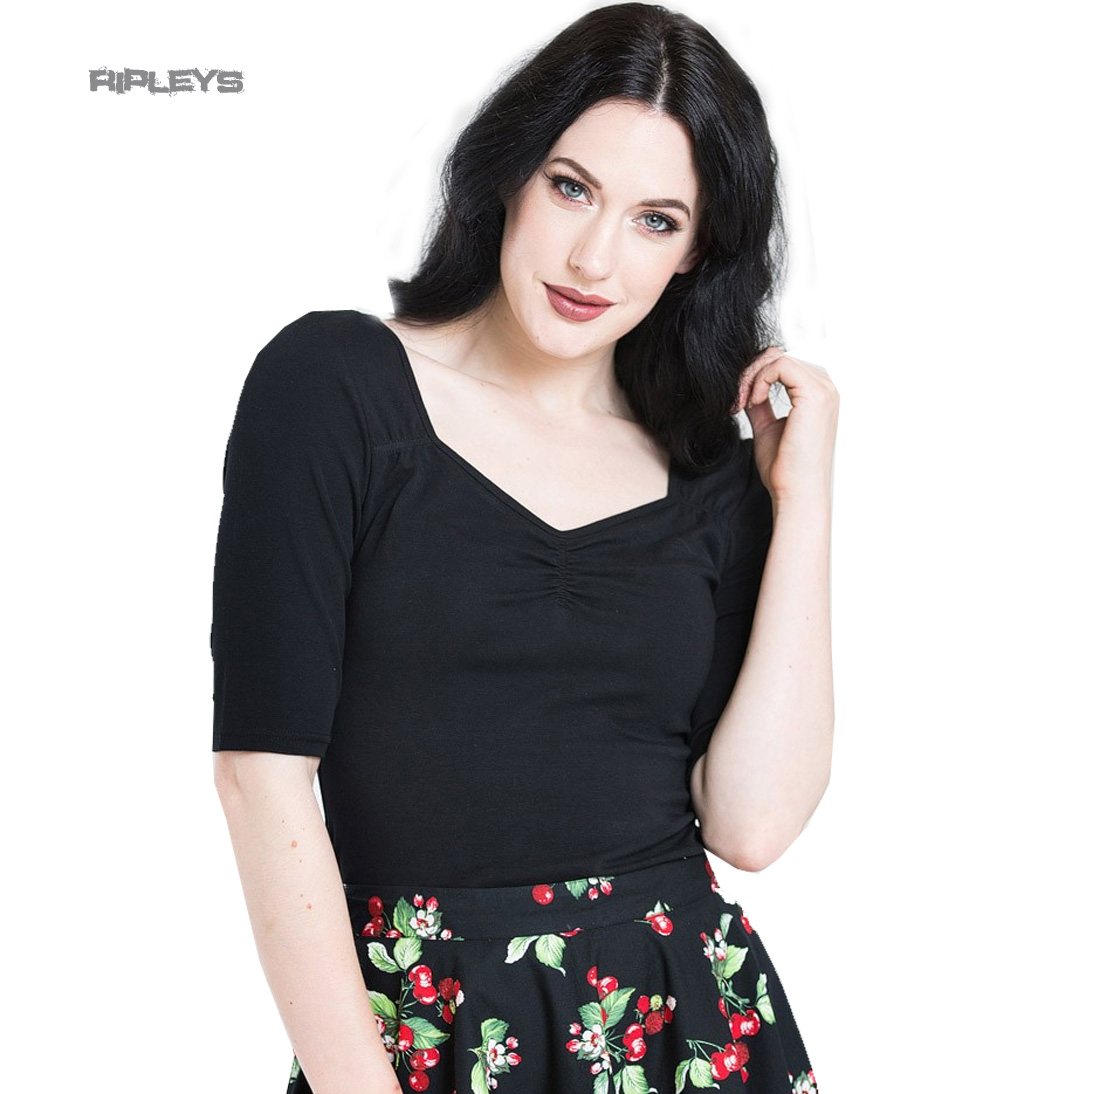 Hell-Bunny-Shirt-50s-Rockabilly-Top-PHILIPPA-Plain-Black-3-4-Sleeves-All-Sizes thumbnail 22